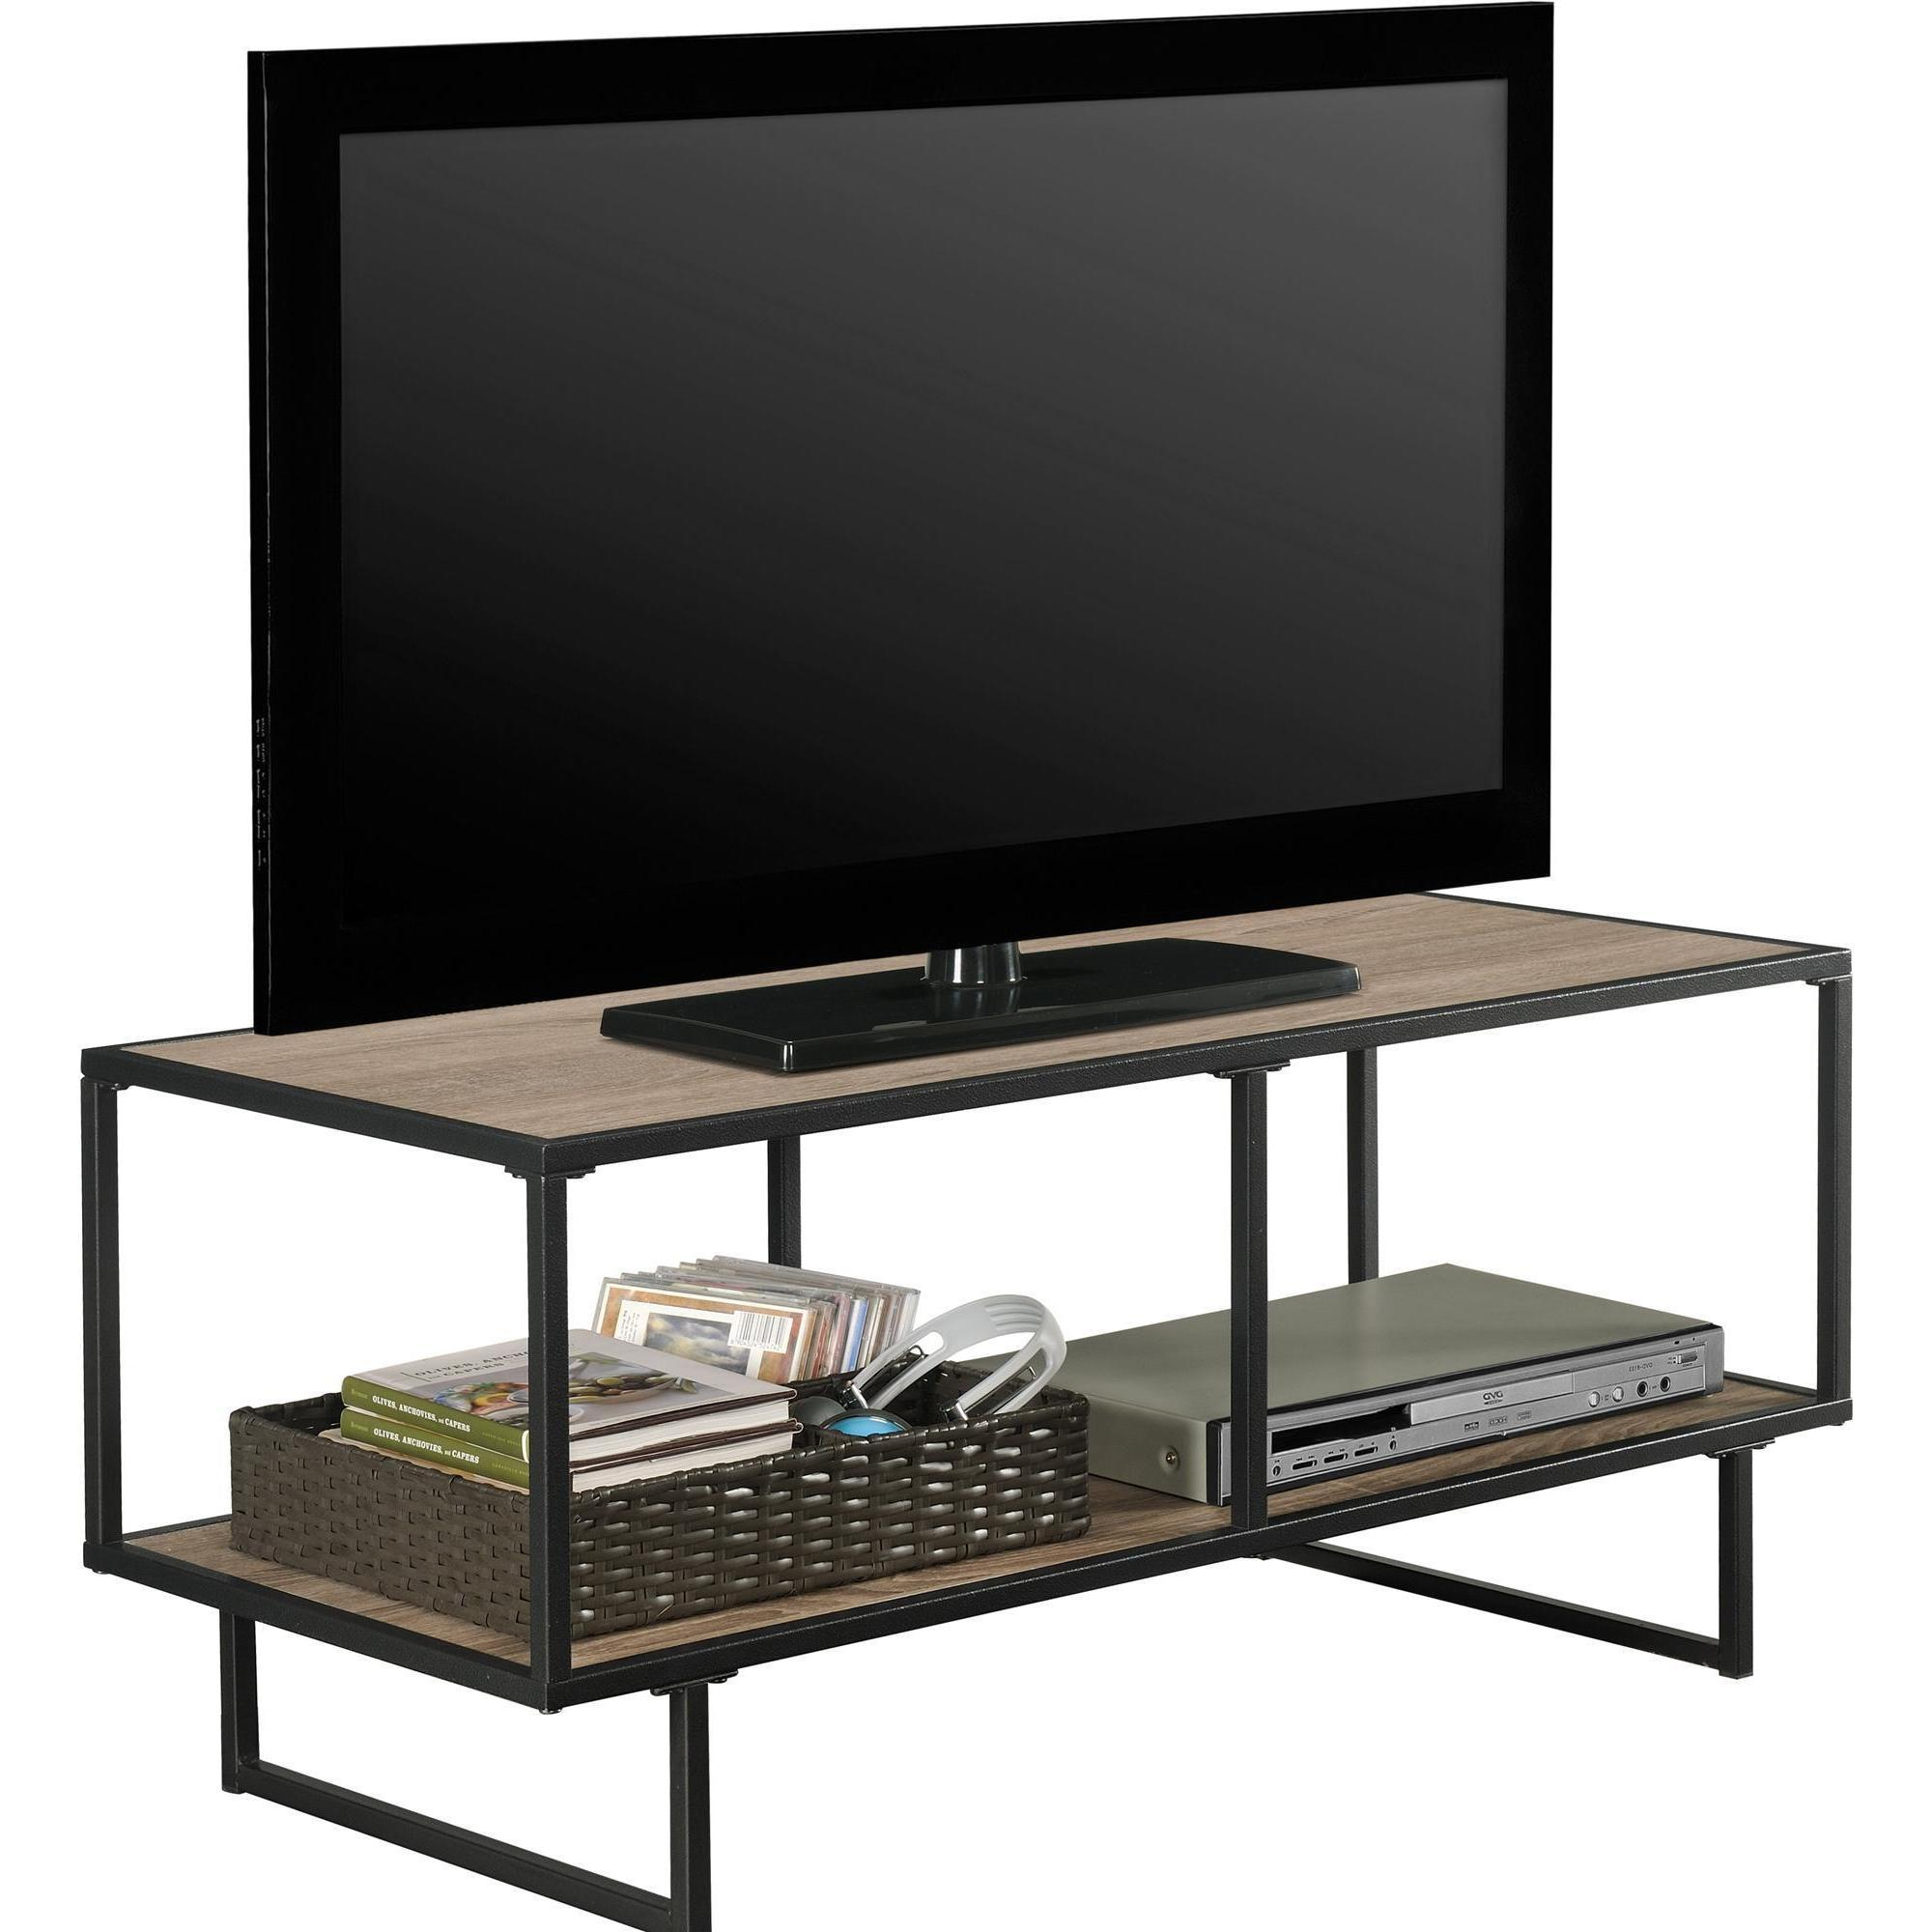 Porch Den Wicker Park Haddon 42 Inch Tv Stand Coffee Table  # Meuble De Tv En Biatrez